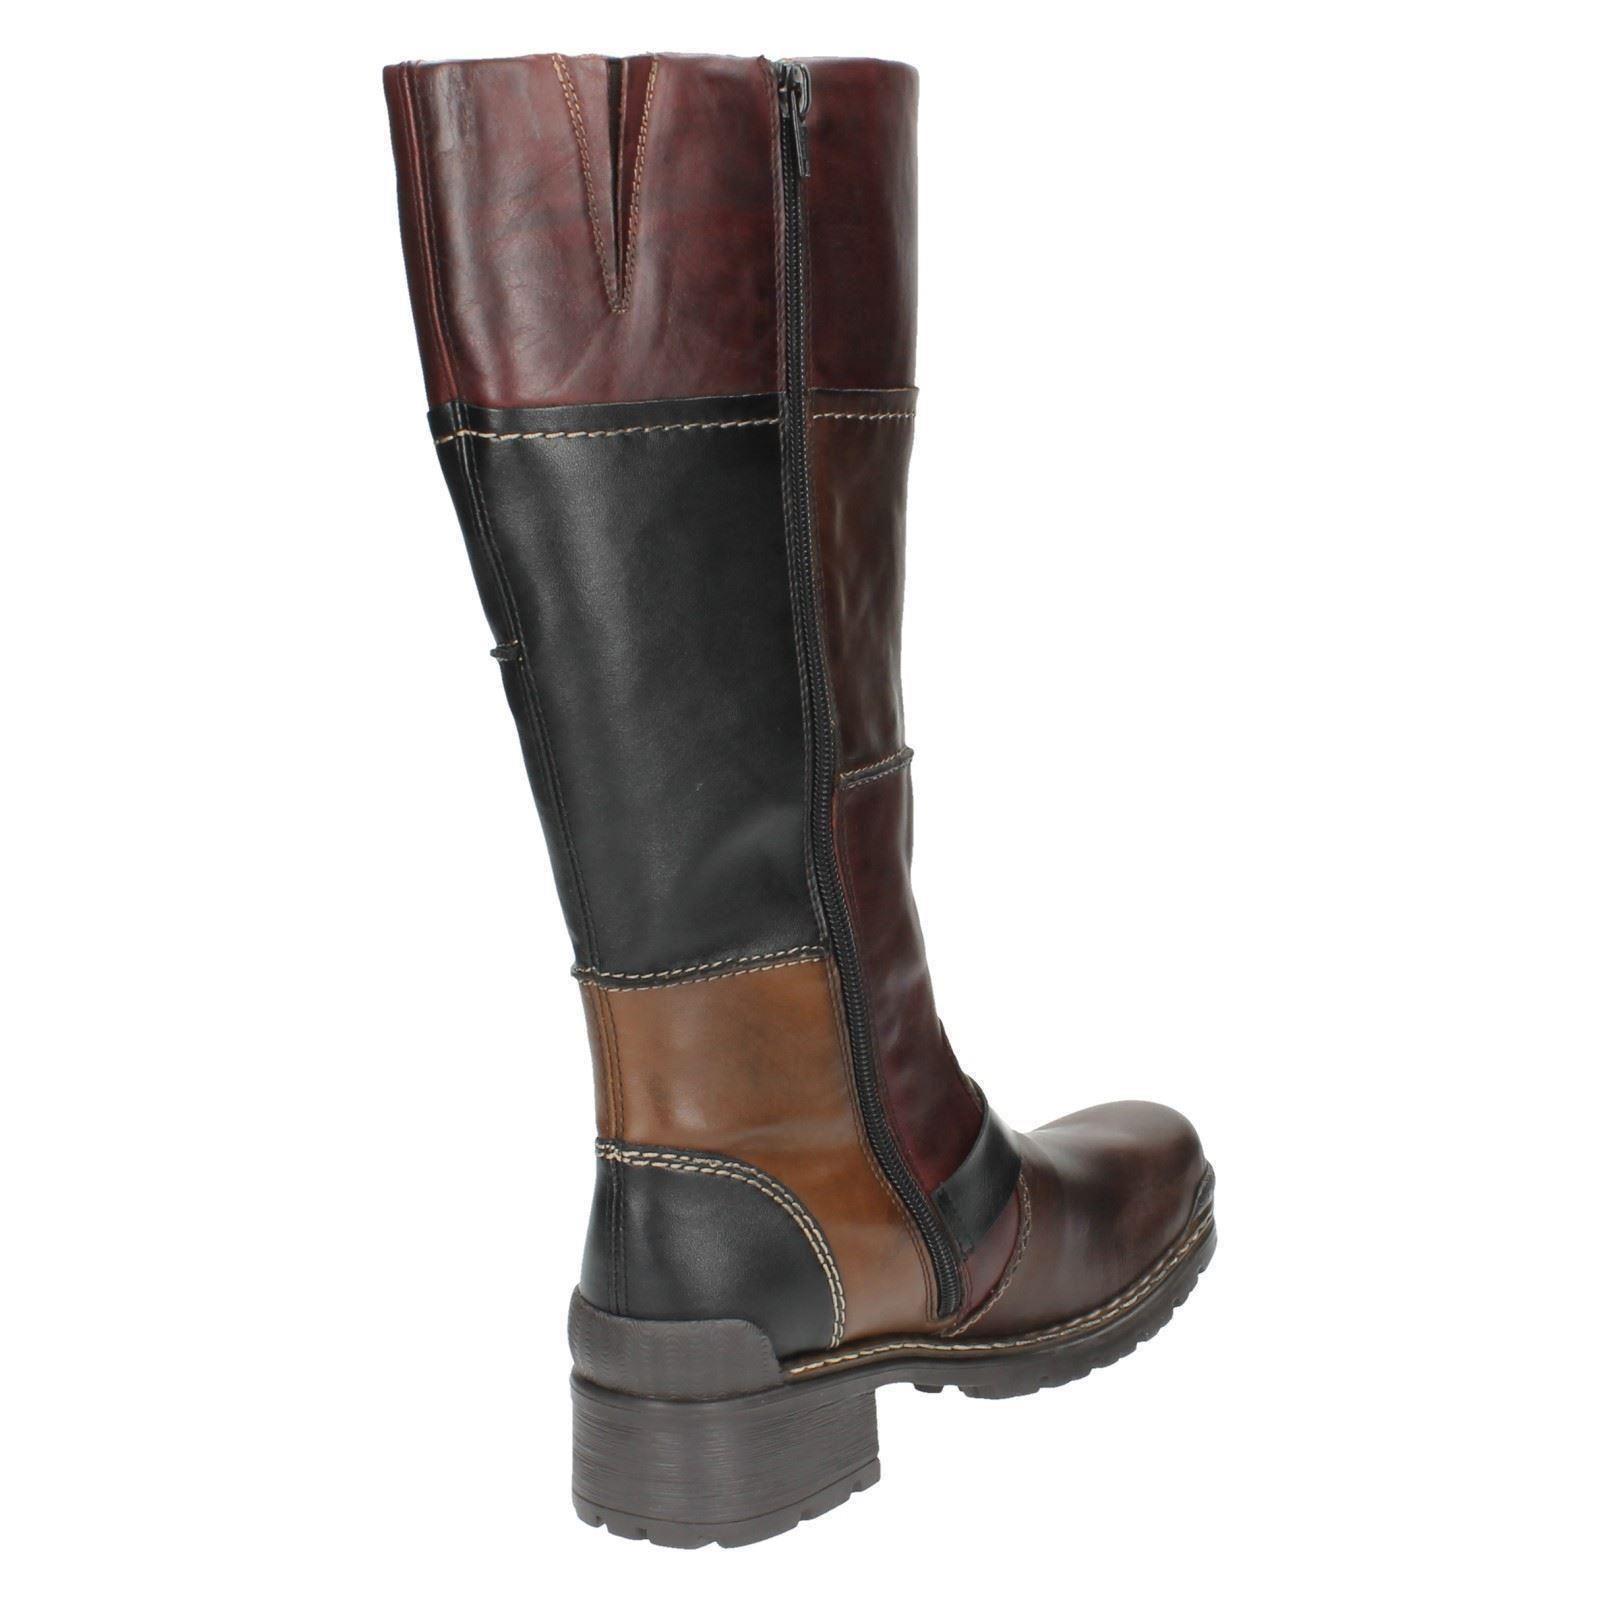 74382 Brown Long Ladies Rieker Boots qpxwUZB6